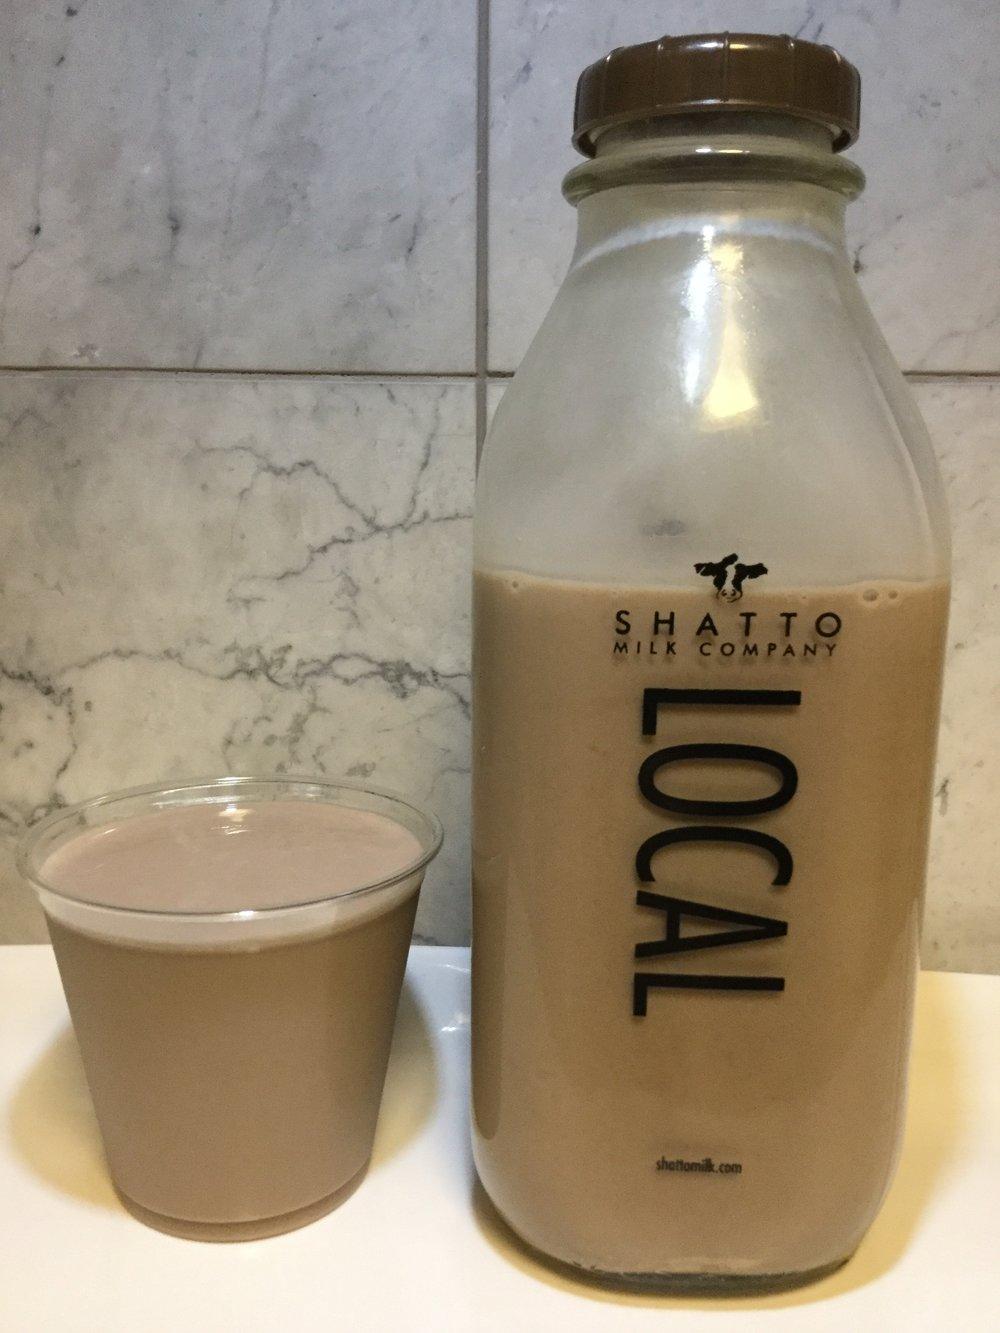 Shatto Chocolate Milk Cup